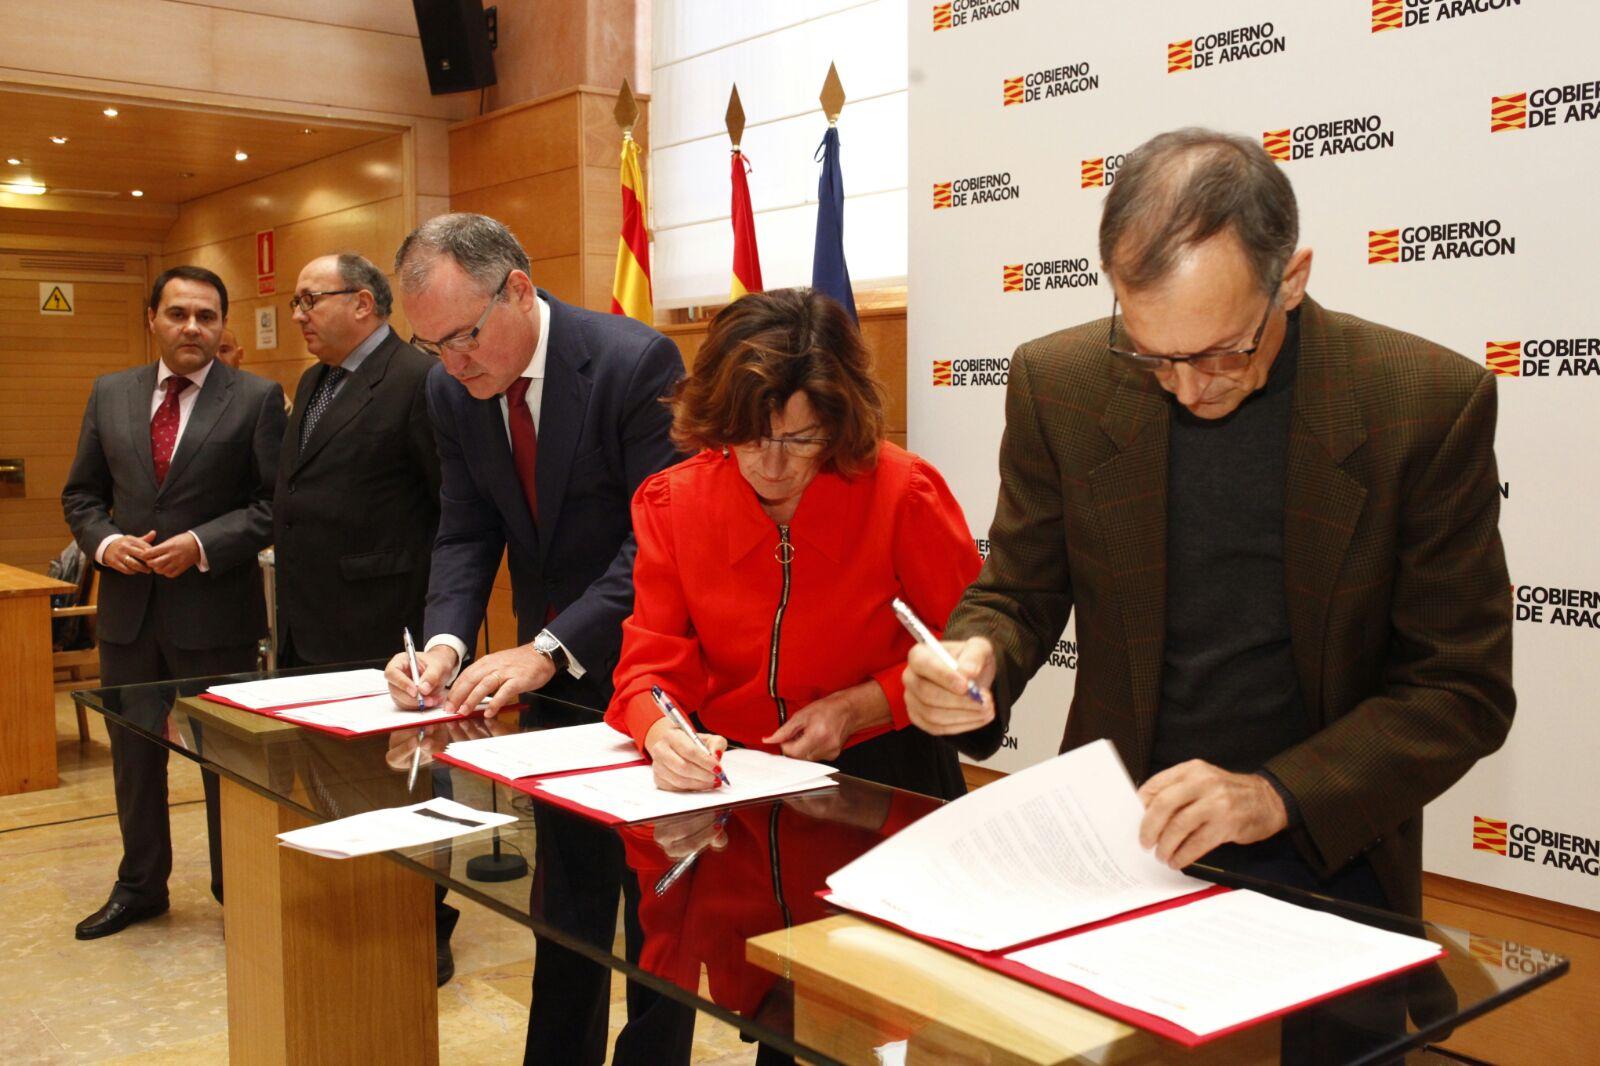 Para disminuir el índice de pobreza energética en #Aragón 600 hogares familias vulnerables @GobAragon, @ecodes y @Endesa firman un convenio https://t.co/Yoh8qtW3pz